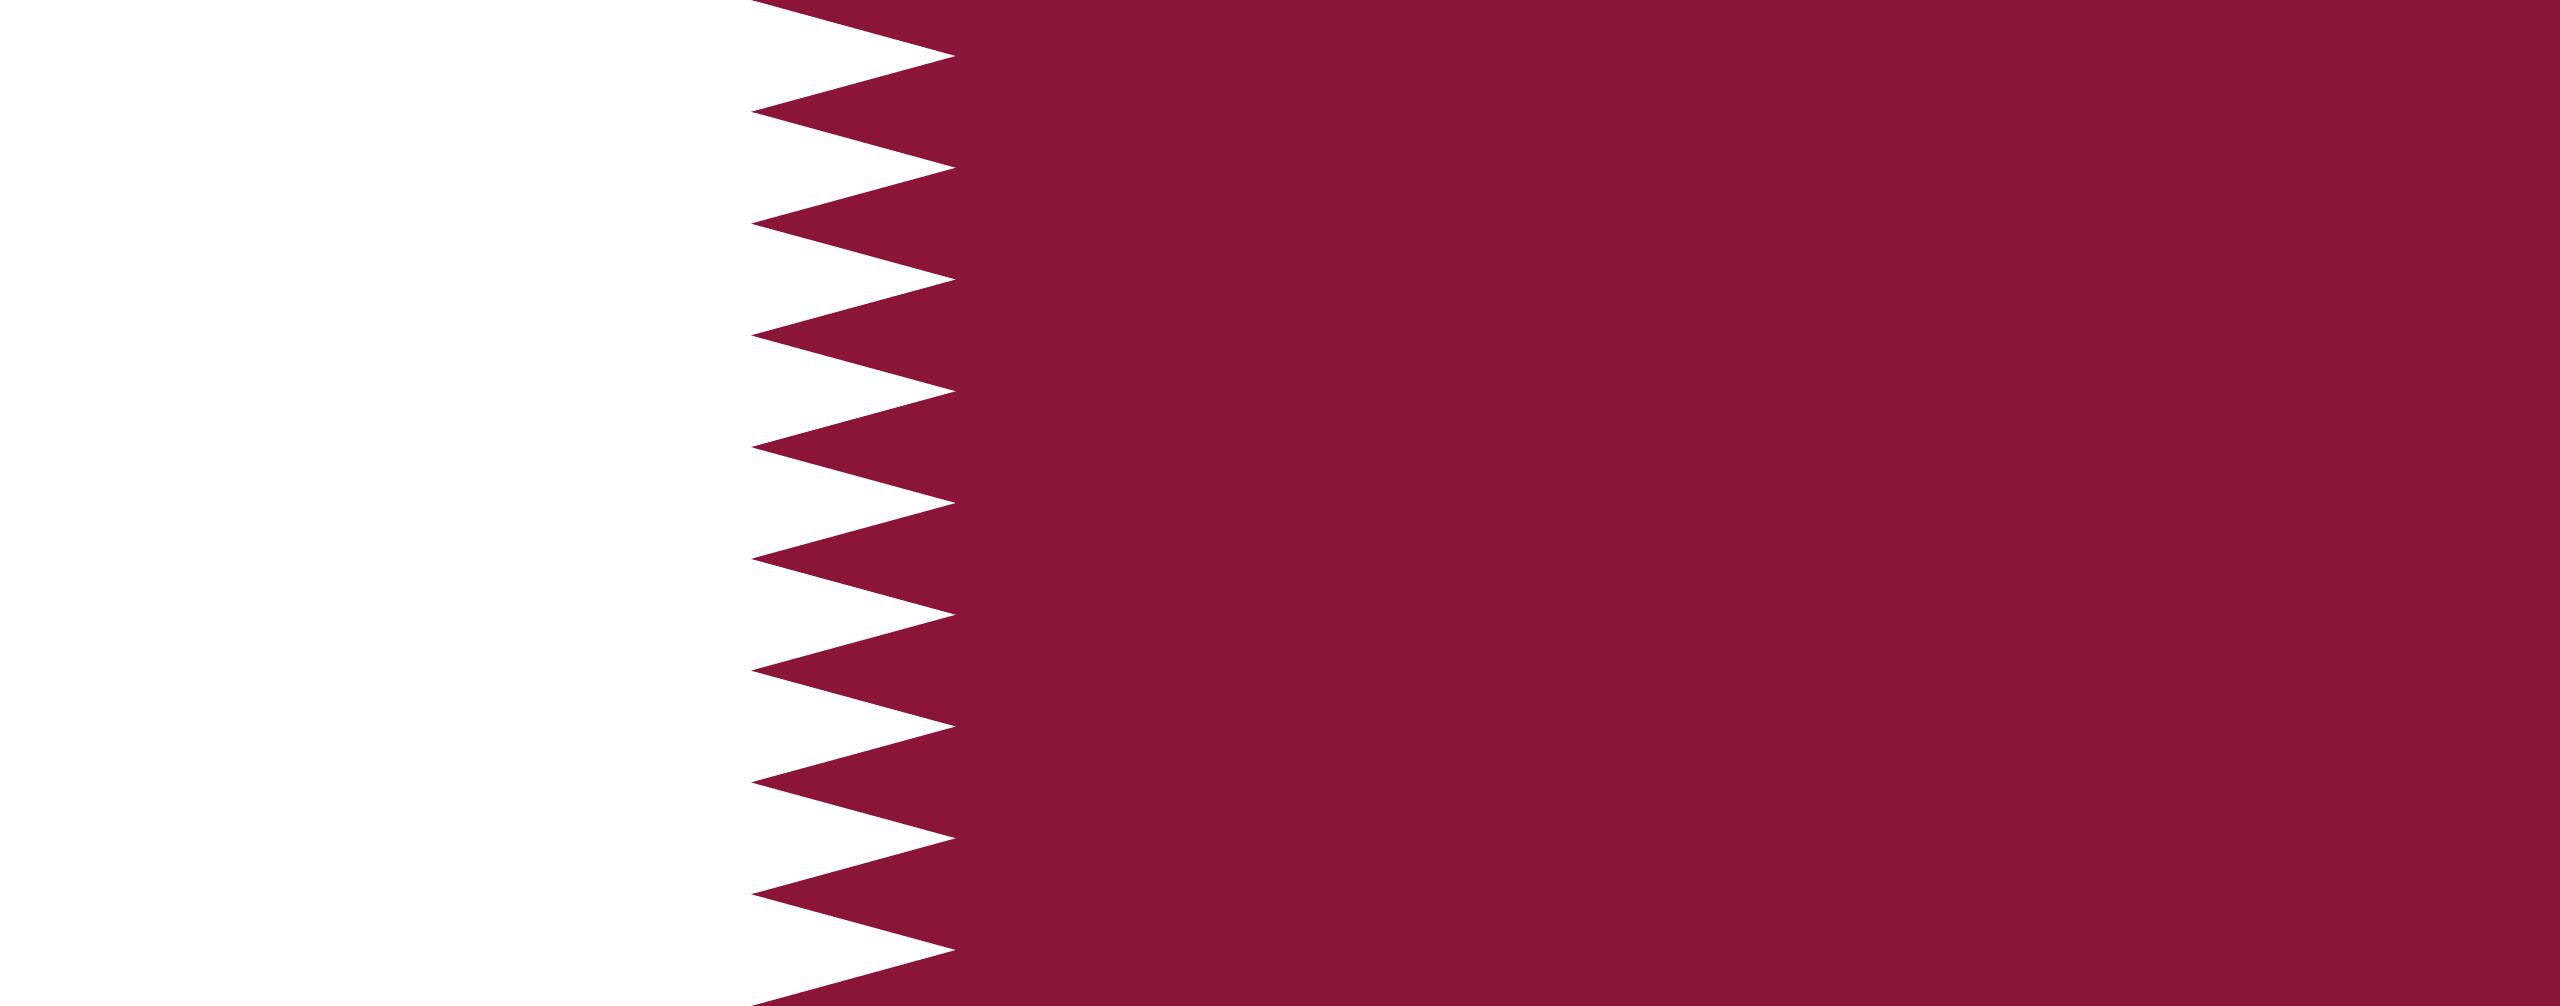 Qatar | Flags of countries